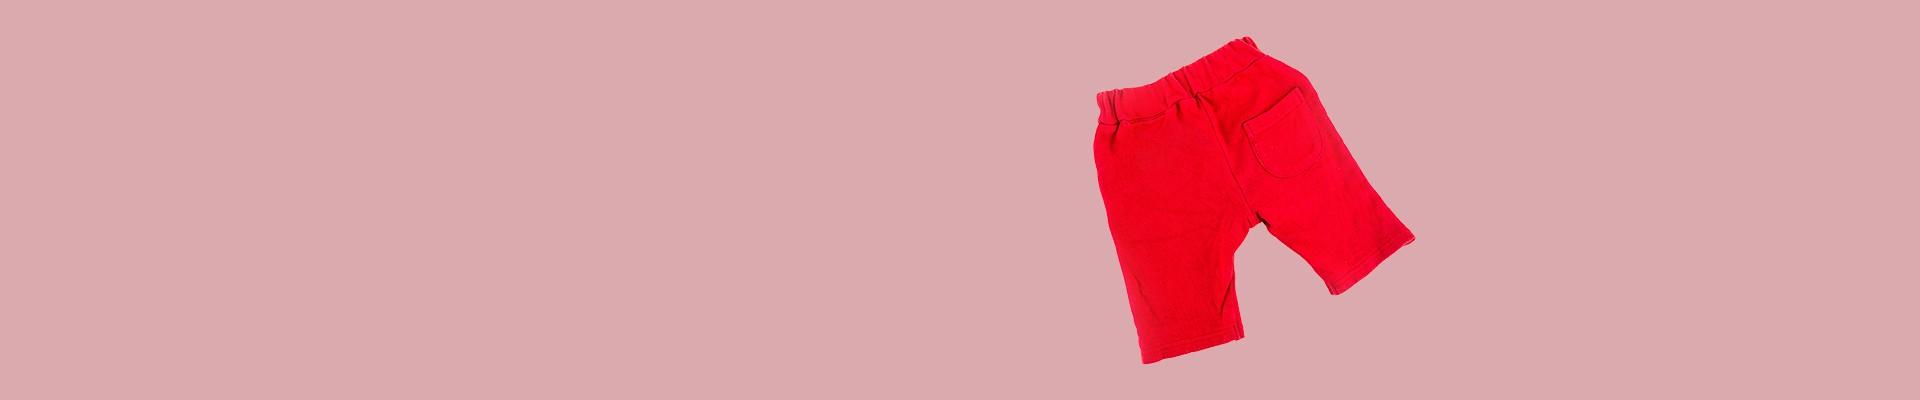 Jual Model Celana Pendek Anak Laki Laki Harga Terbaik